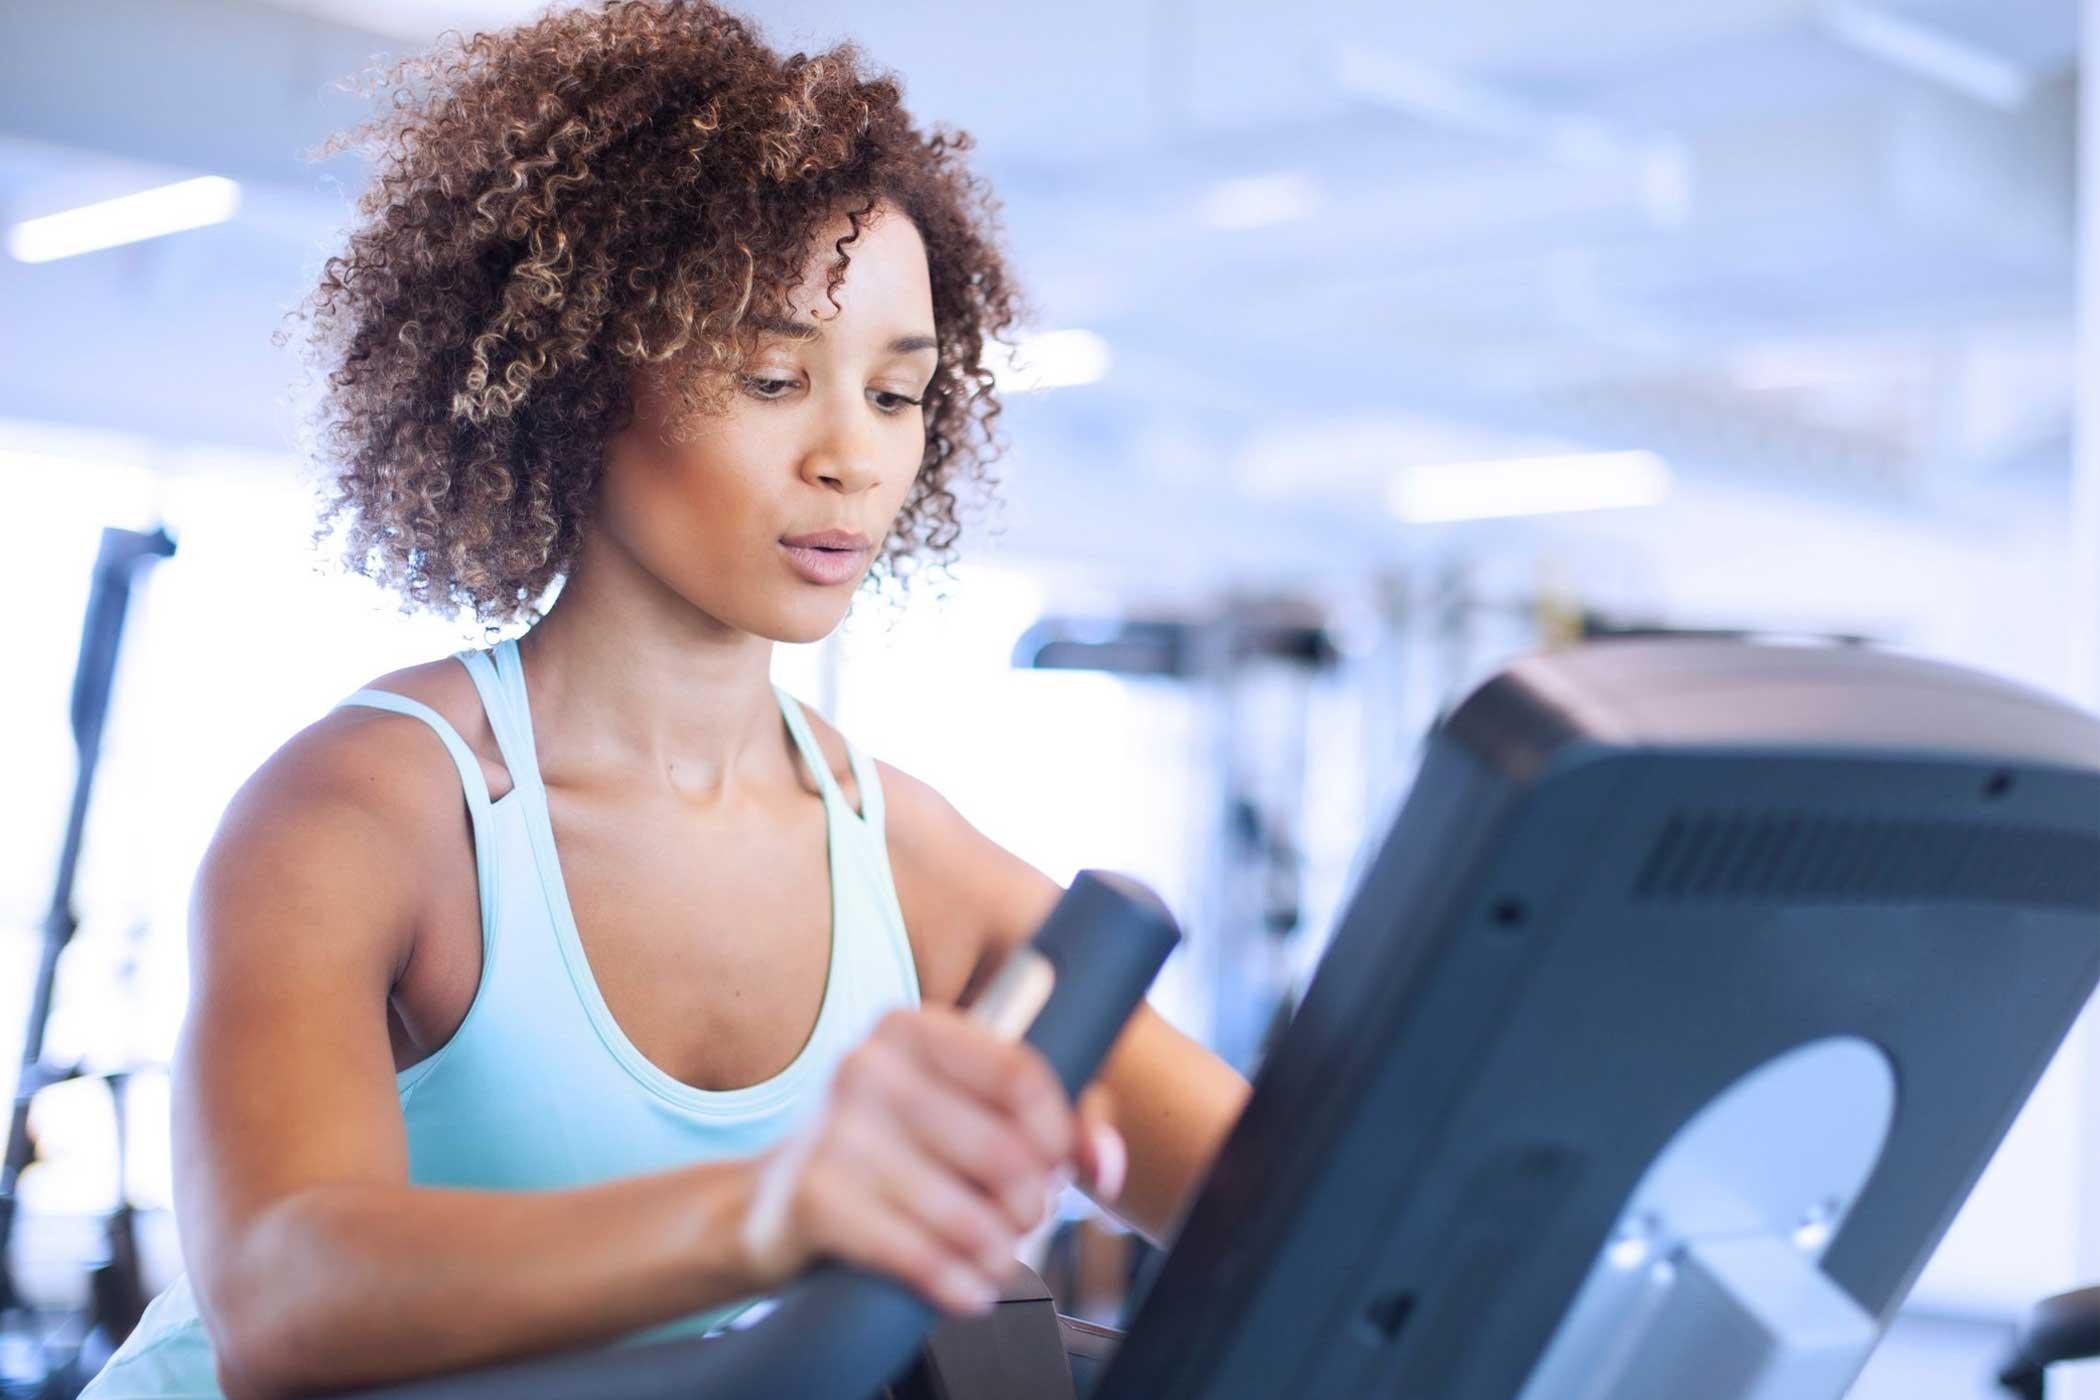 elliptical workout for beginner runners